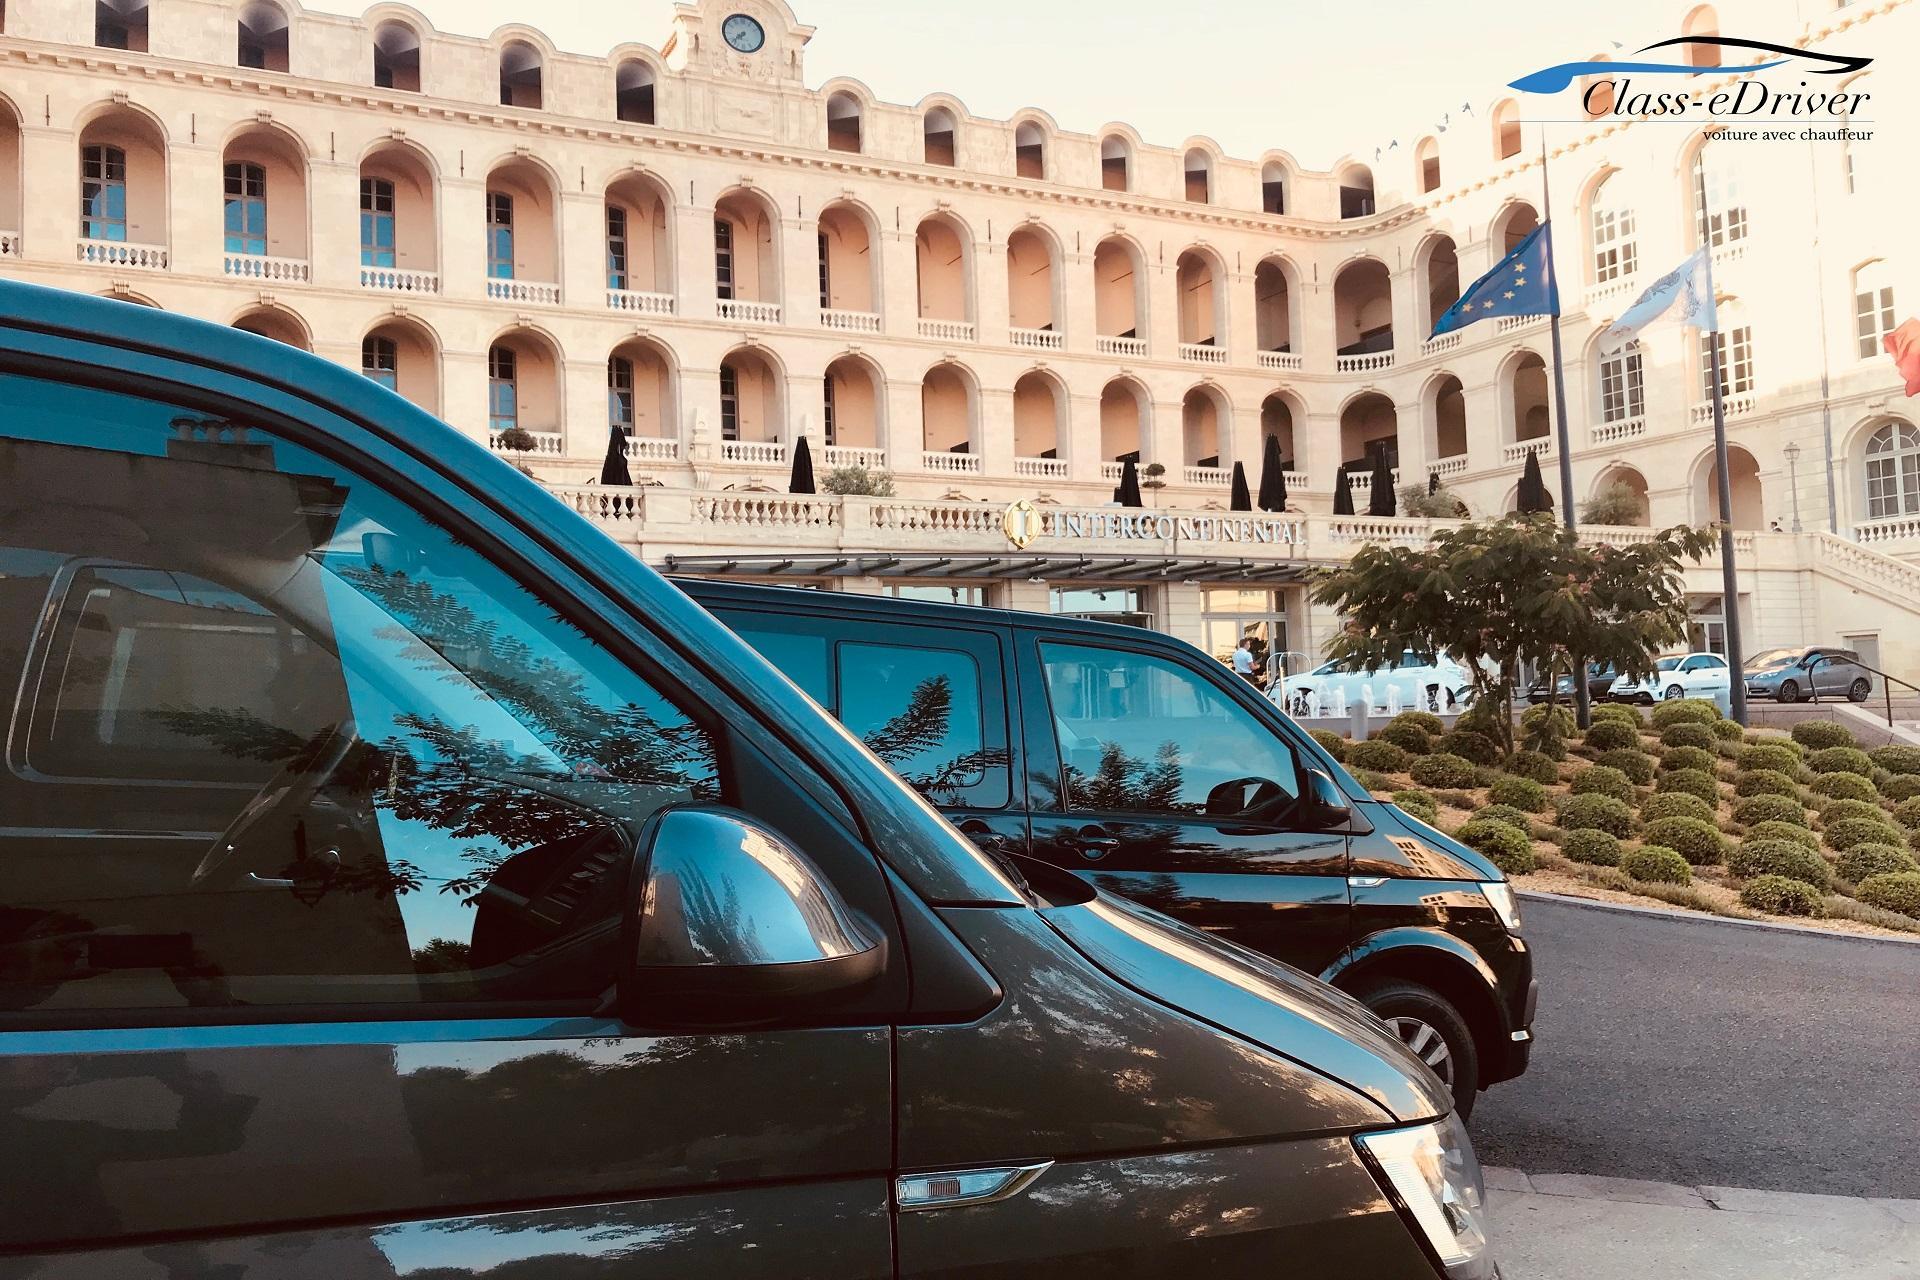 class-edriver-location-voiture-chauffeur-transfert-seminaires-provence-aix-marseille